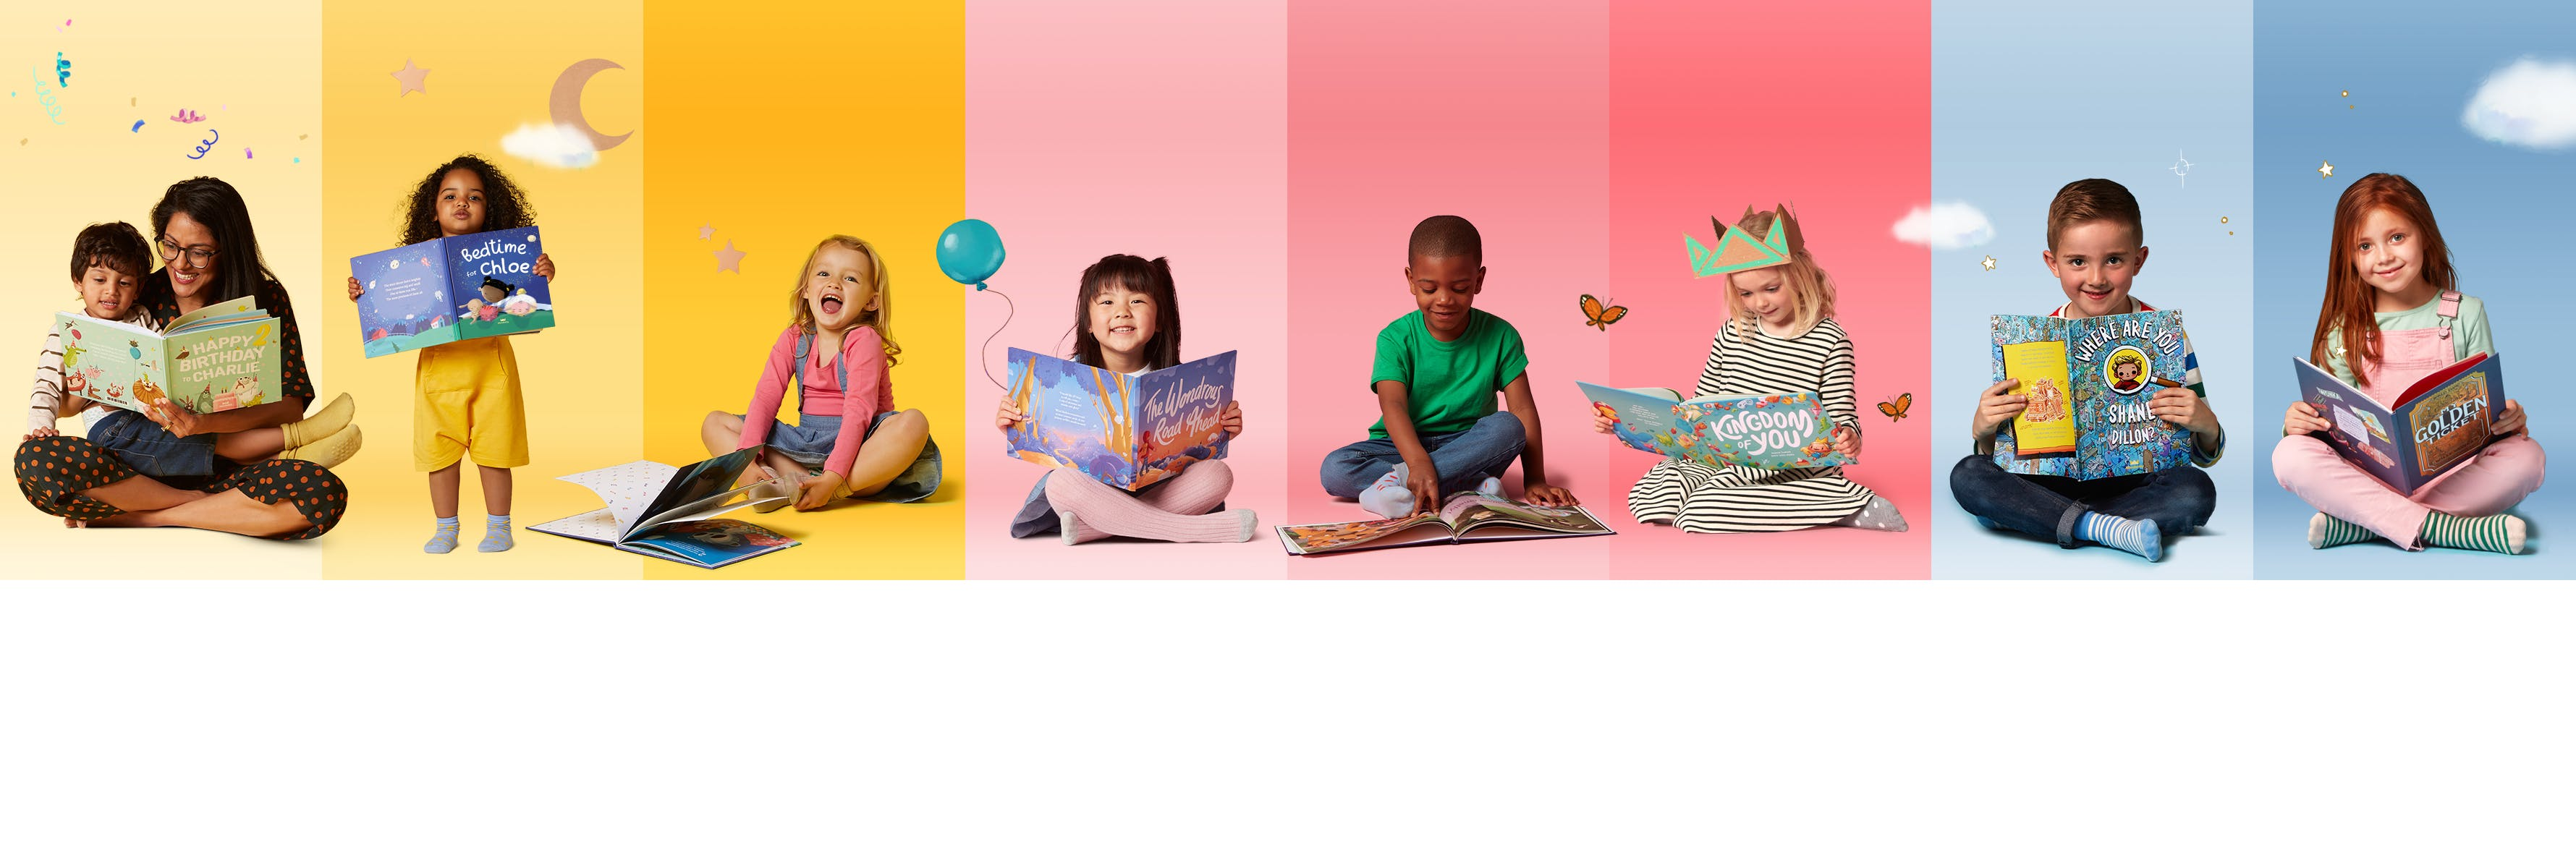 Multiple children reading Wonderbly books against a mutli-coloured background